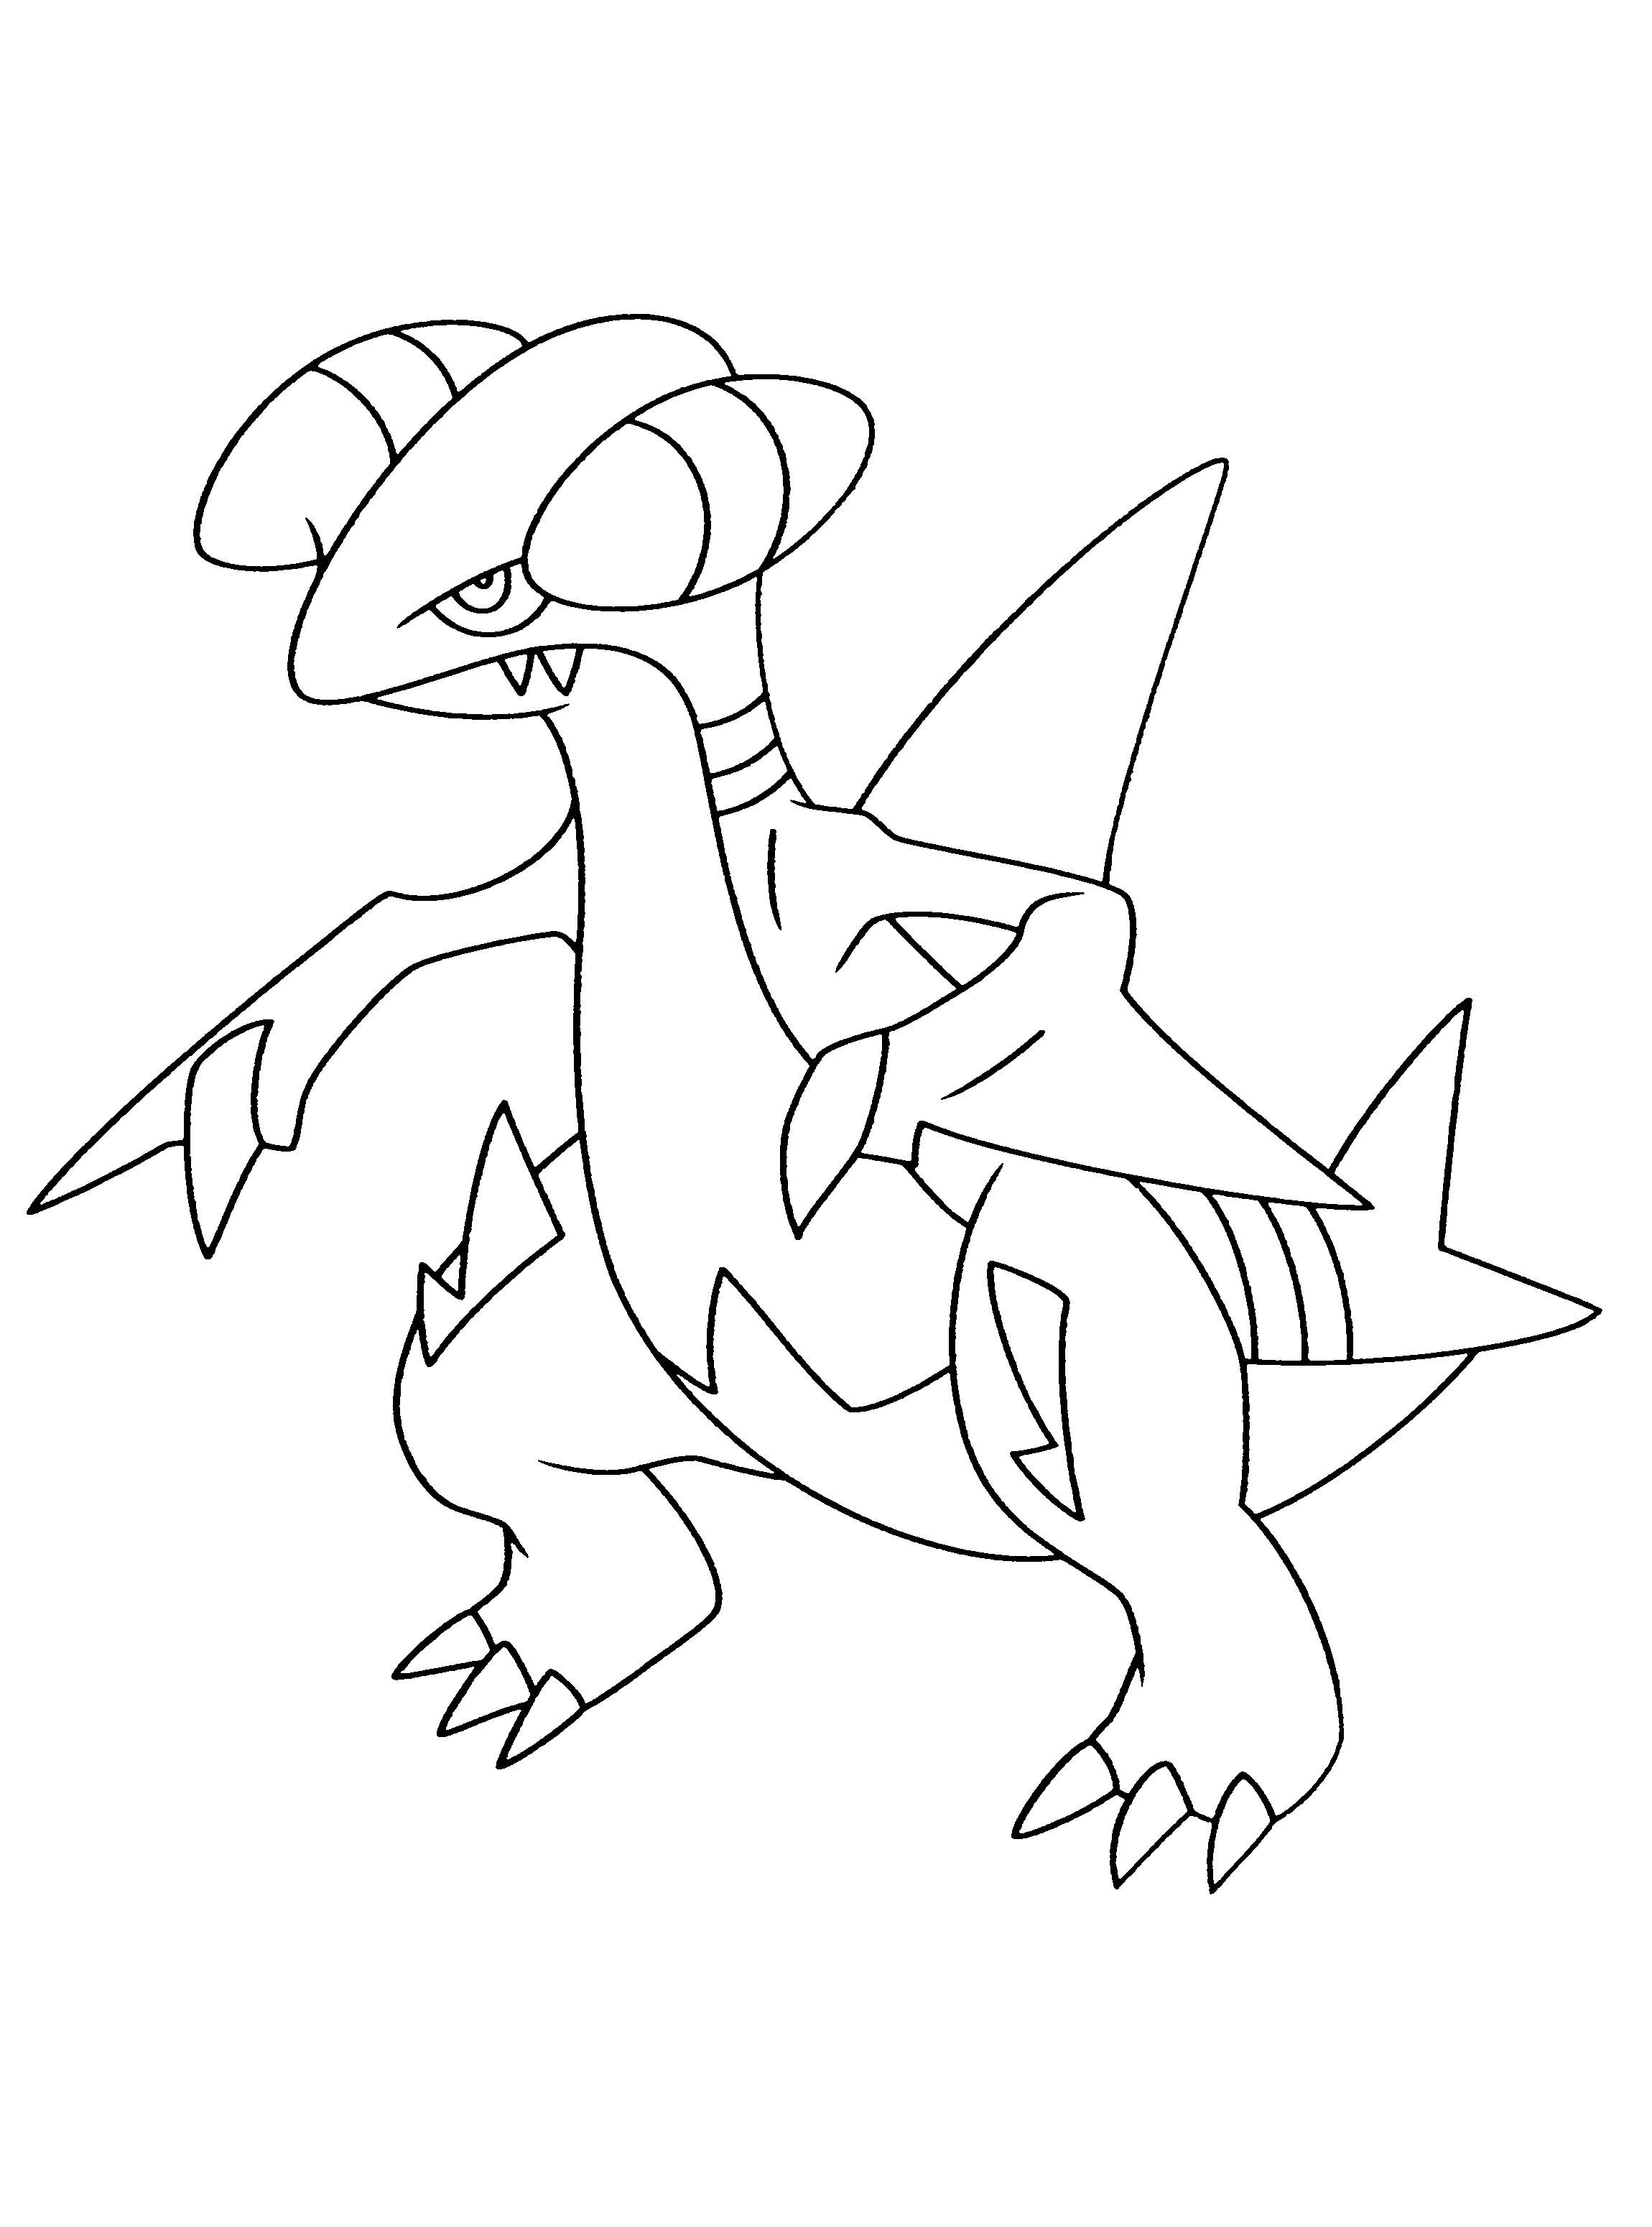 Ausmalbilder Pokemon Plinfa Einzigartig Mandala Pokemon Ausdrucken Sammlung